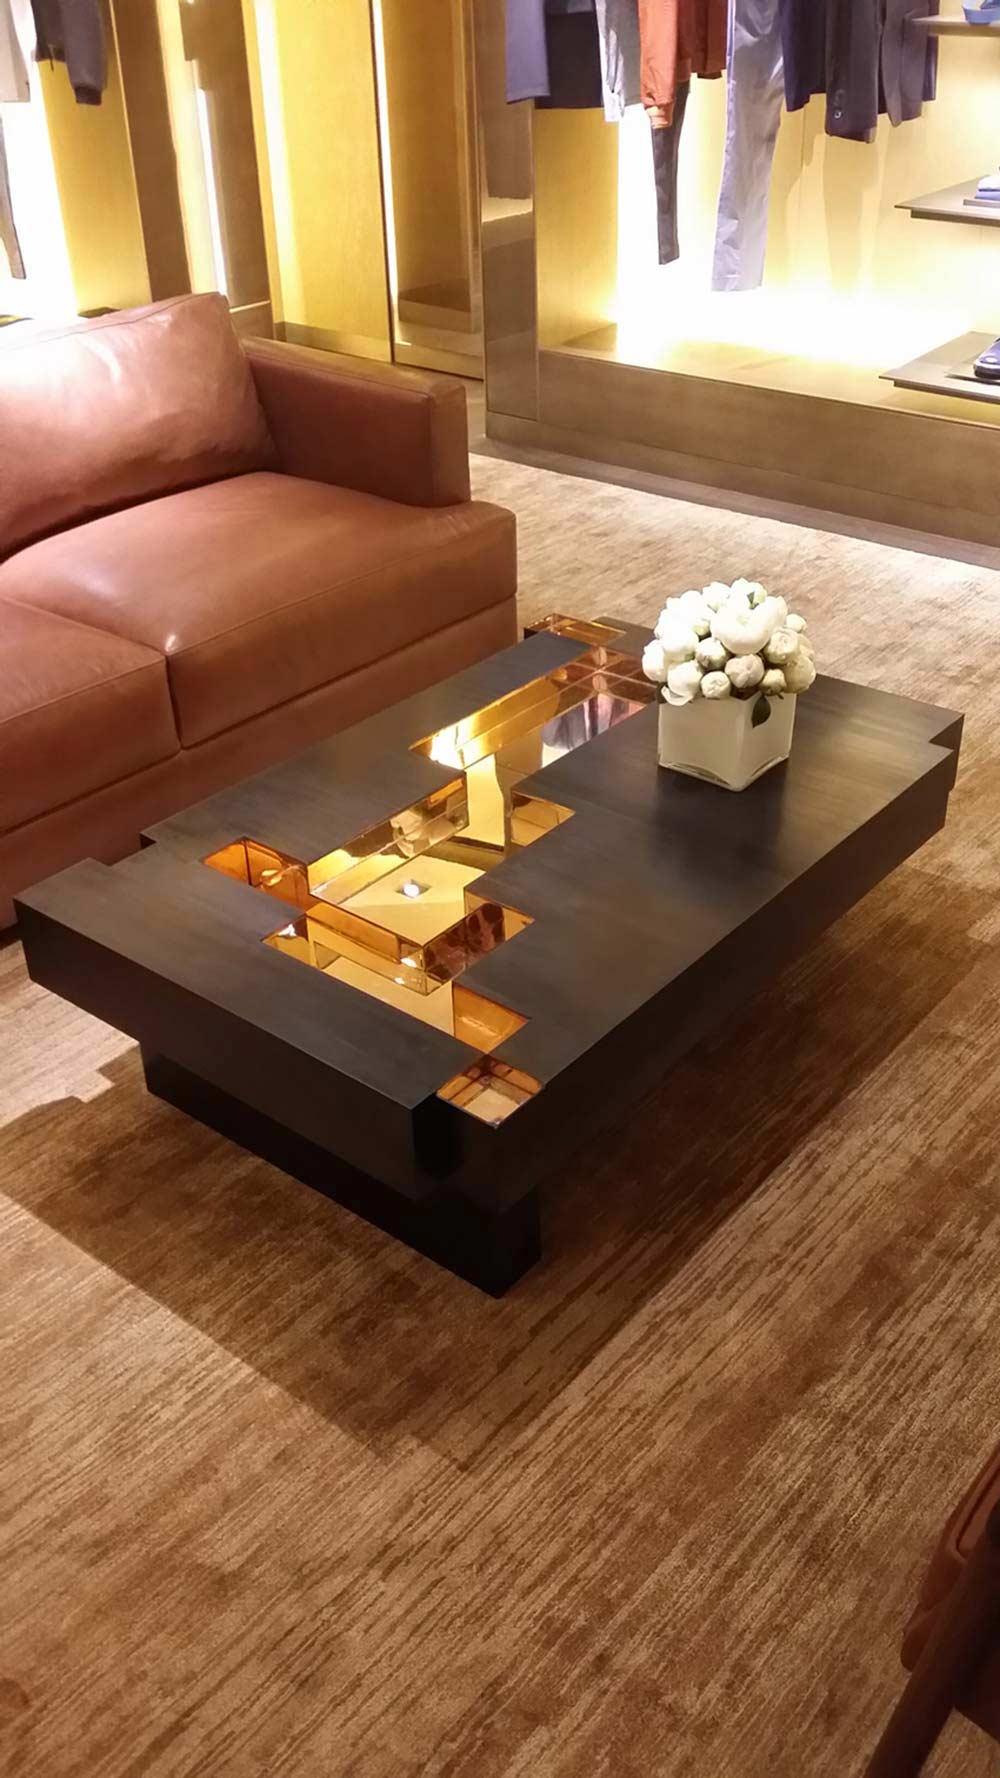 studio-nucleo_metals-bronze-coffee-table_fendi-london_low